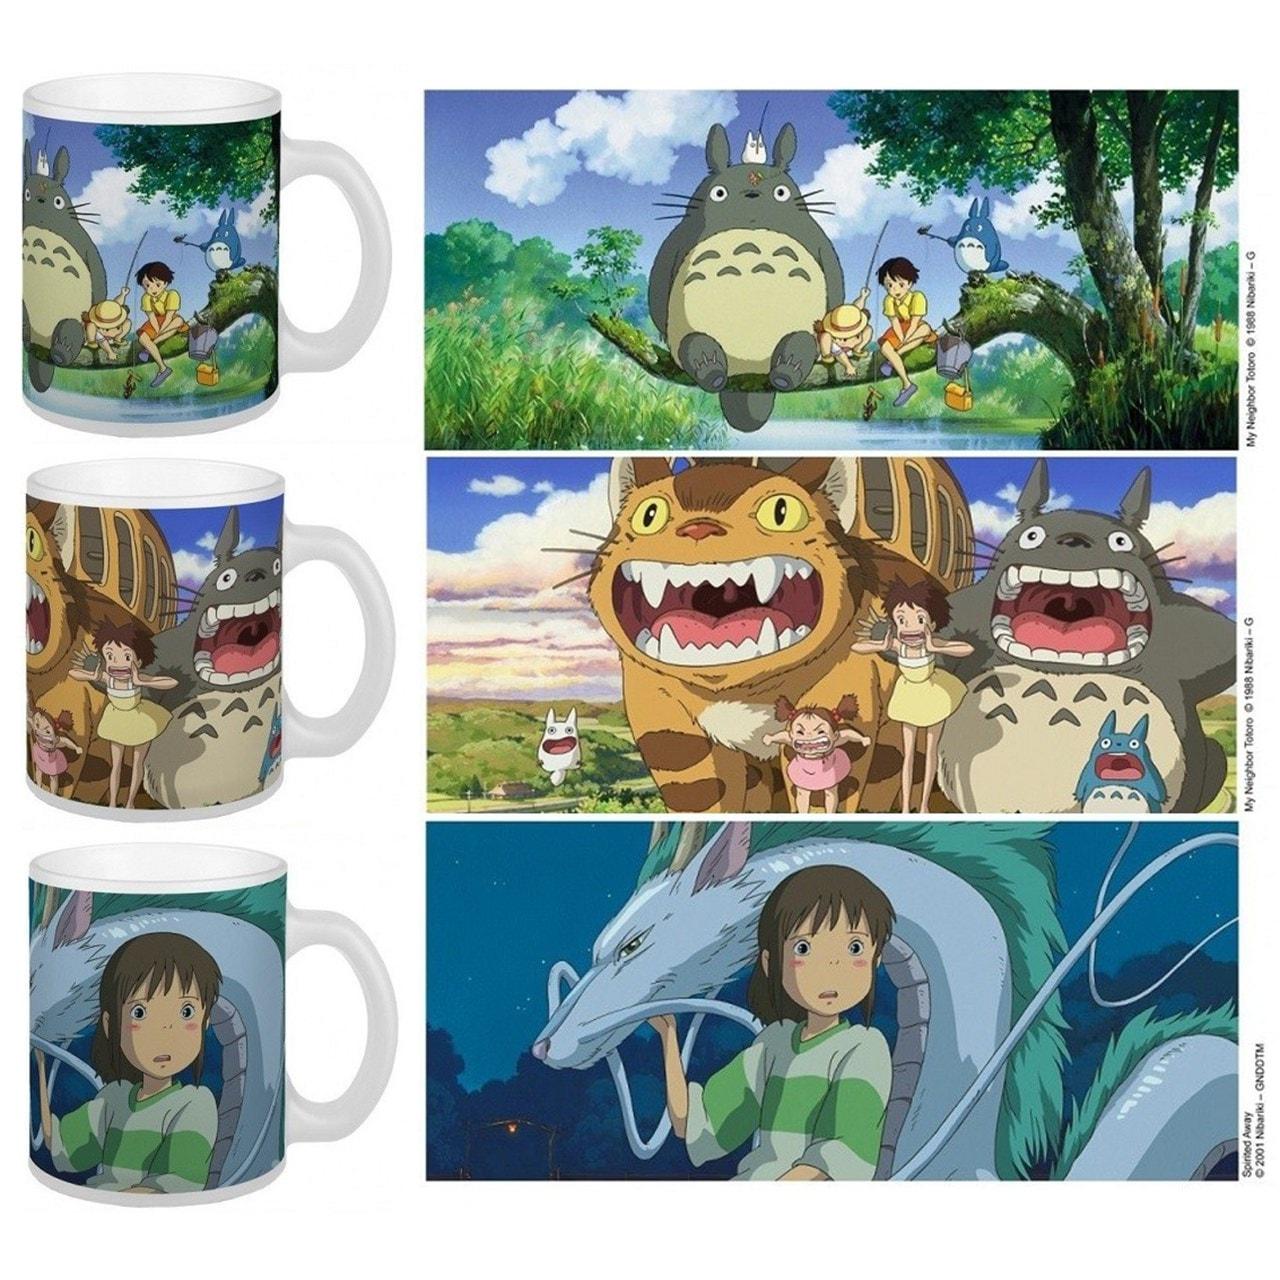 Studio Ghibli: Chihiri & Totoro Mug - 1